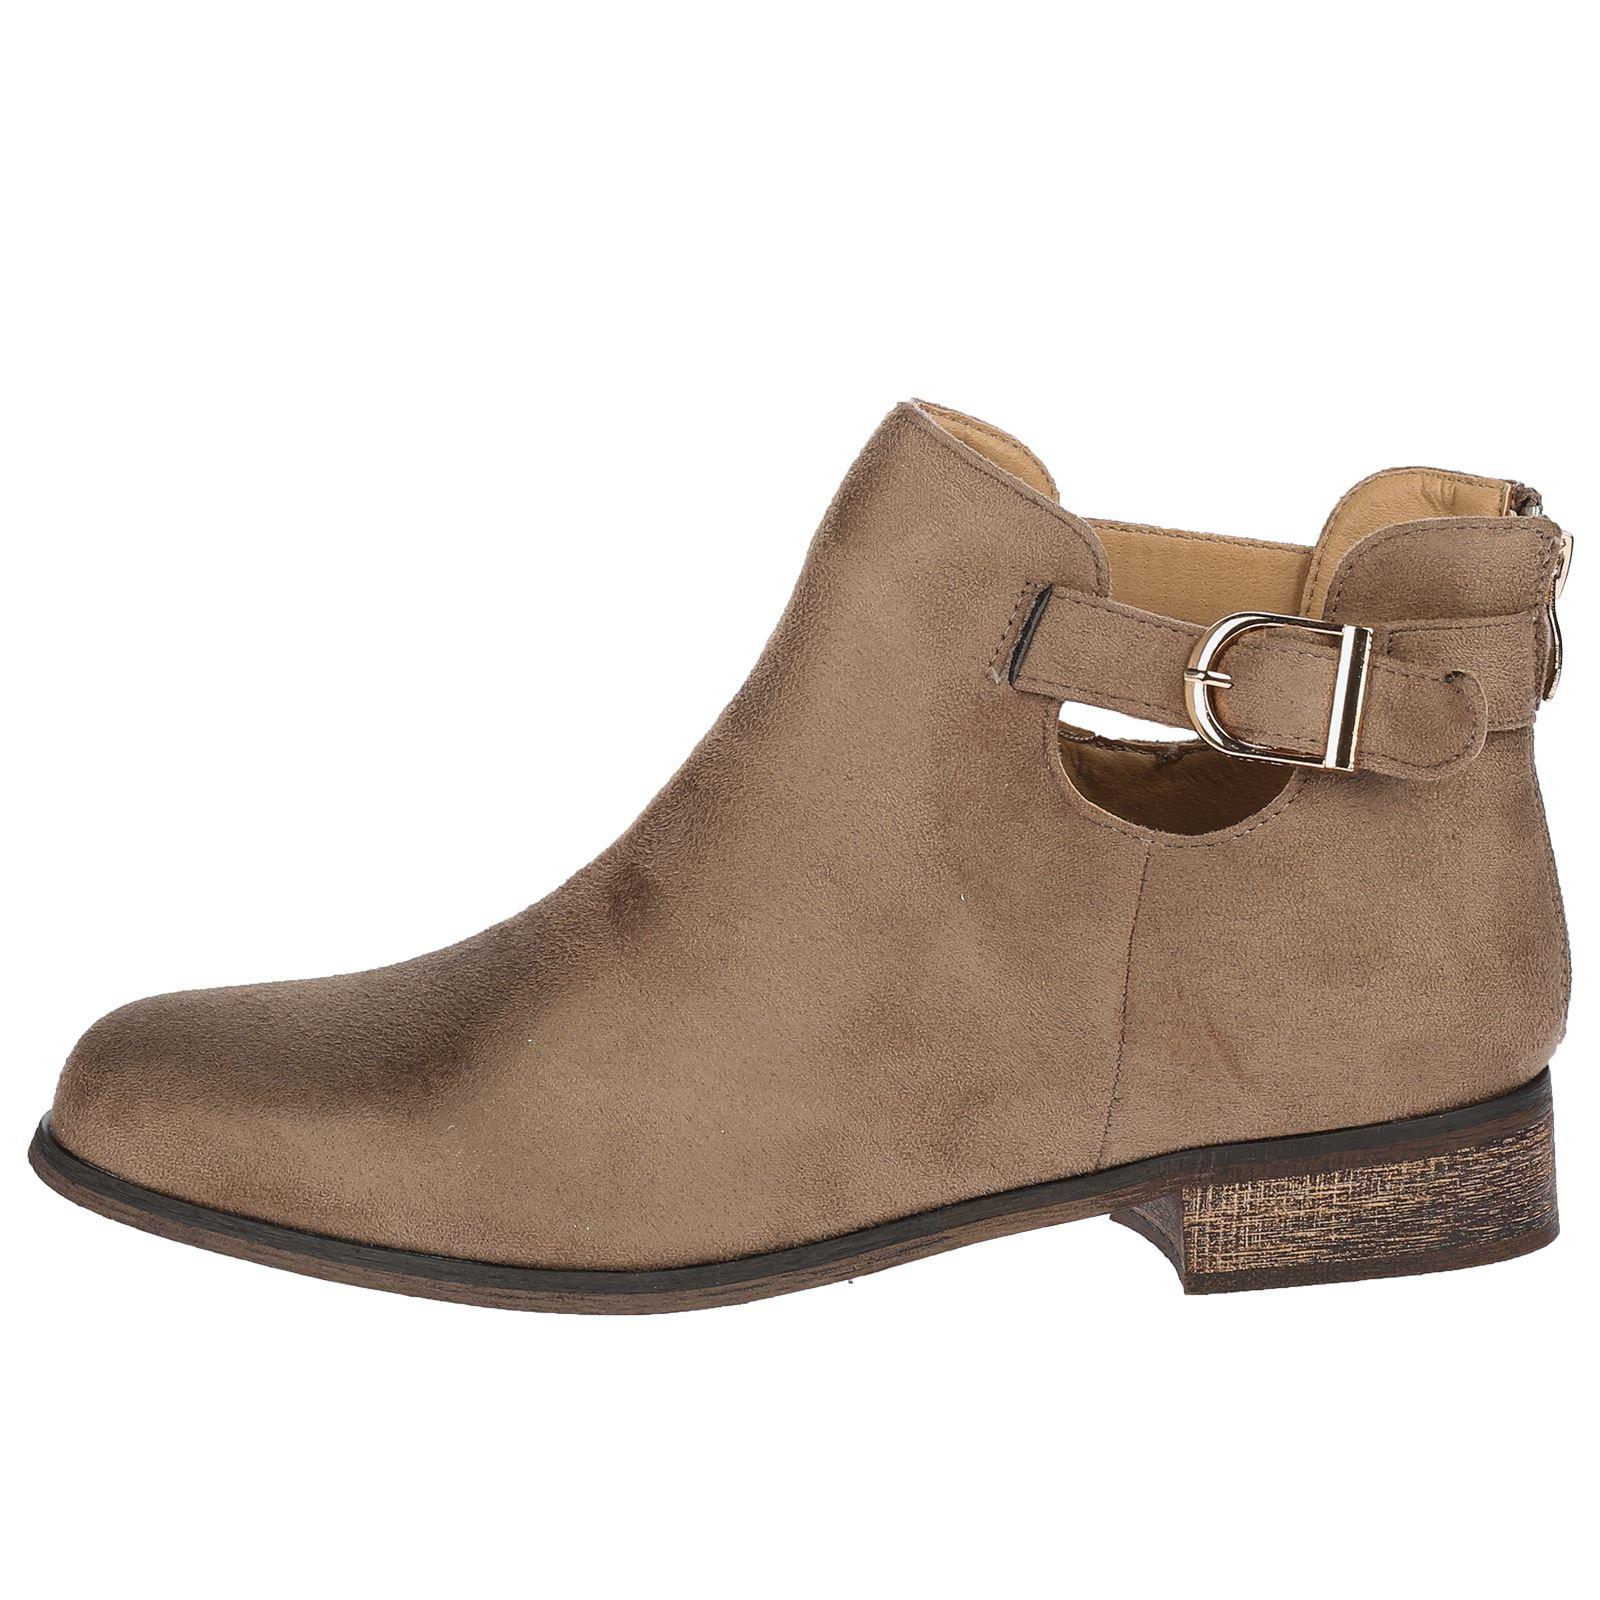 Womens Flat Heels Slip On No Shoe Lace